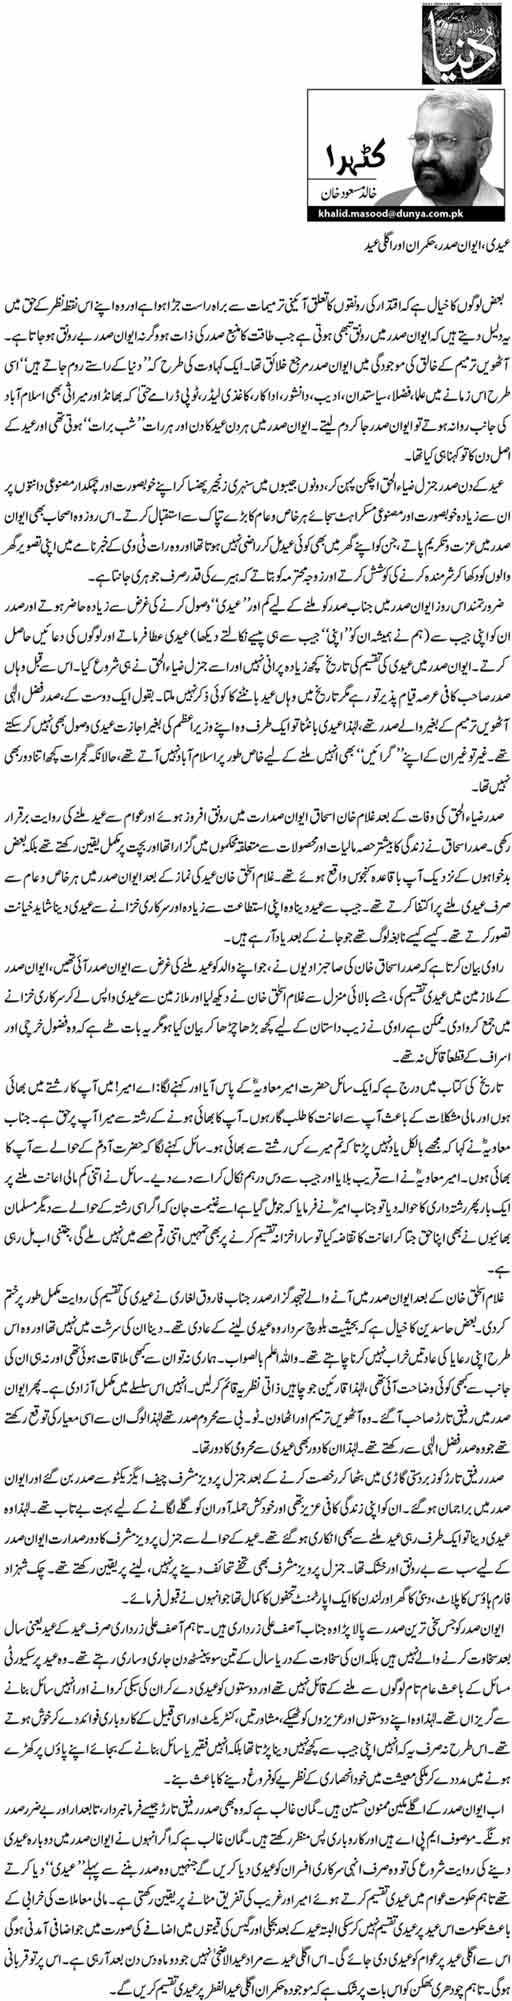 Eidi, Aiwan e Sadar, Hukmaran Aur Agli Eid - Khalid Masood Khan